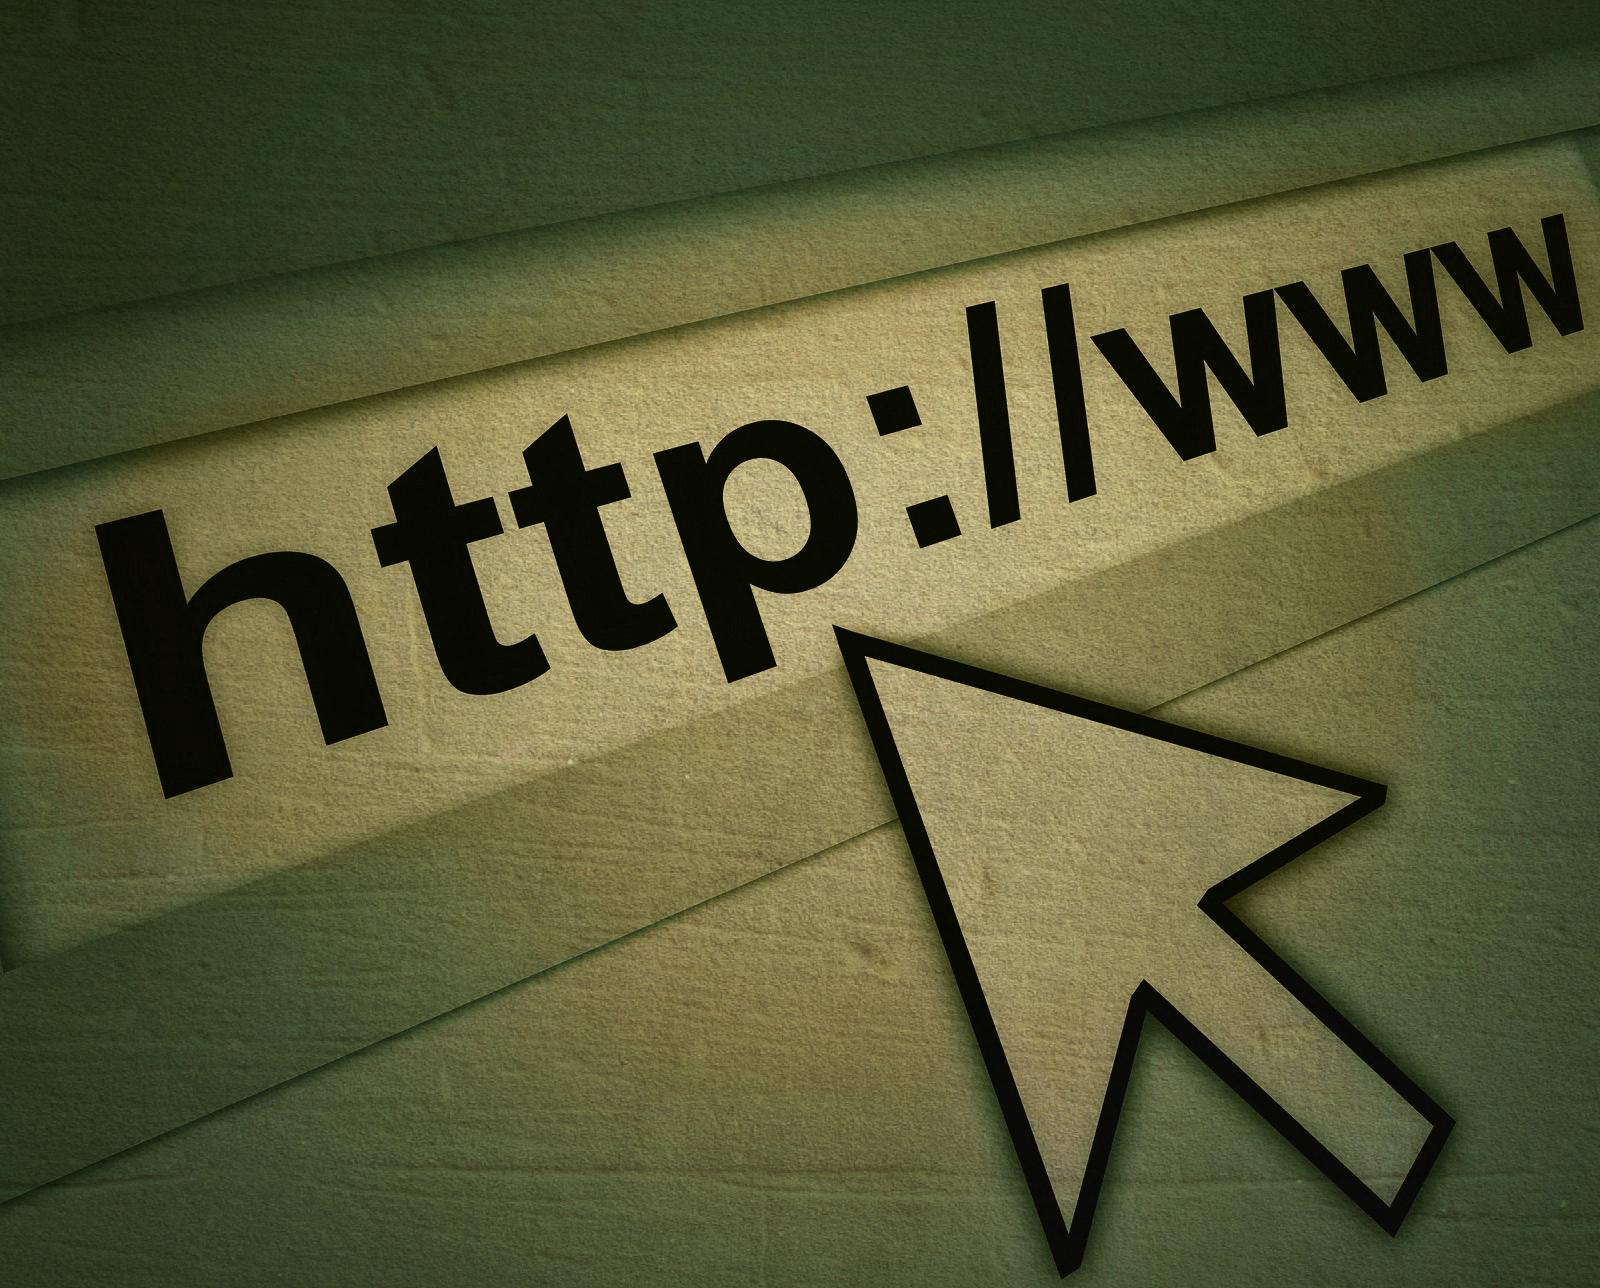 http://4.bp.blogspot.com/-MXAqXPmlSwY/Tg8FeX_Qa5I/AAAAAAAAAmY/XX7eZCl-fso/s1600/Prompt+%252360.jpg